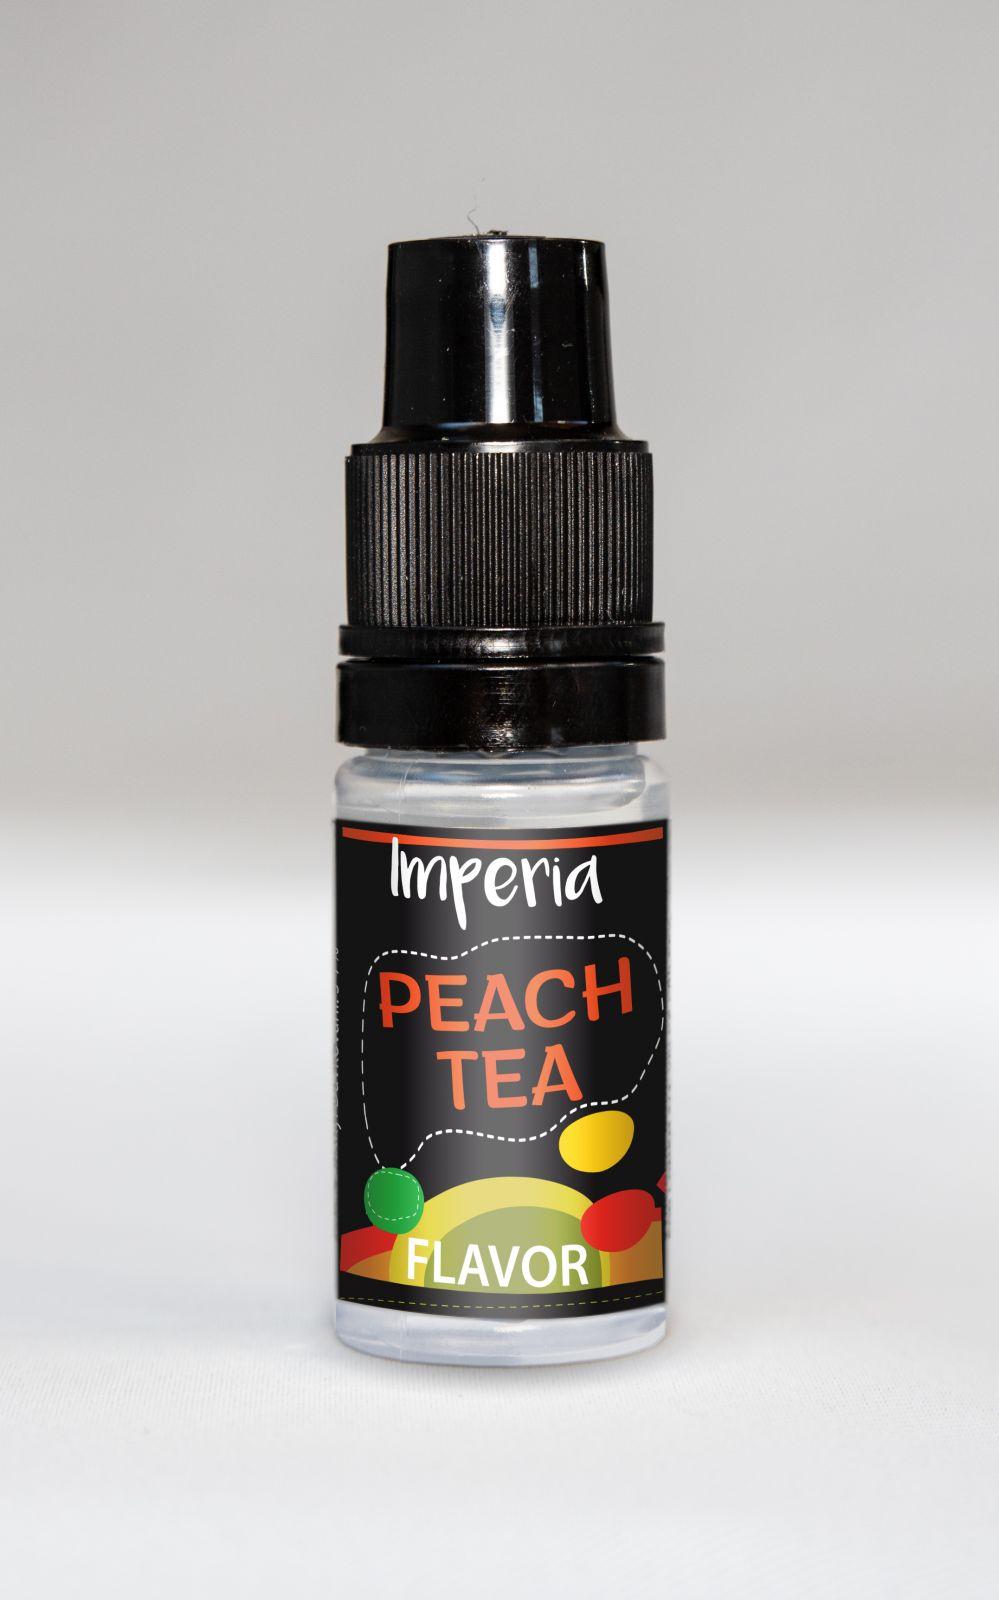 PEACH TEA - Aroma Imperia Black Label Boudoir Samadhi s.r.o.